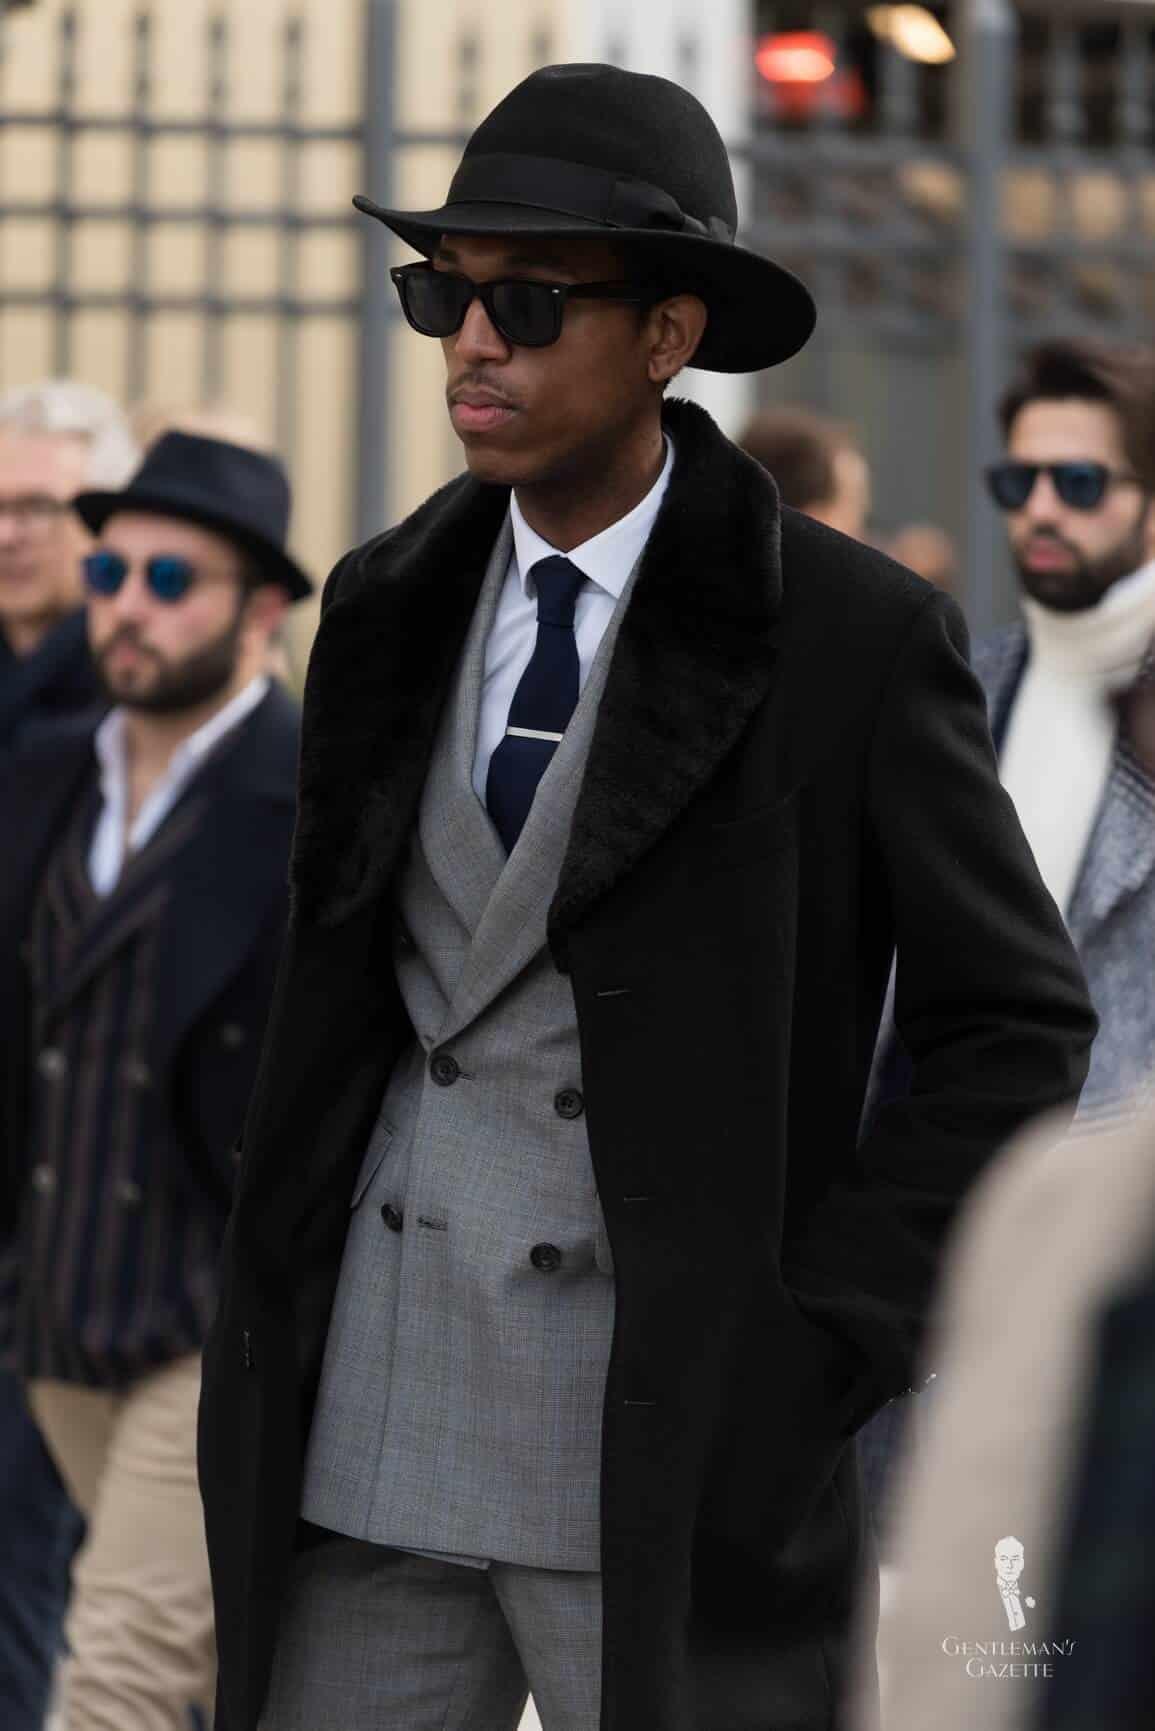 Black overcoats